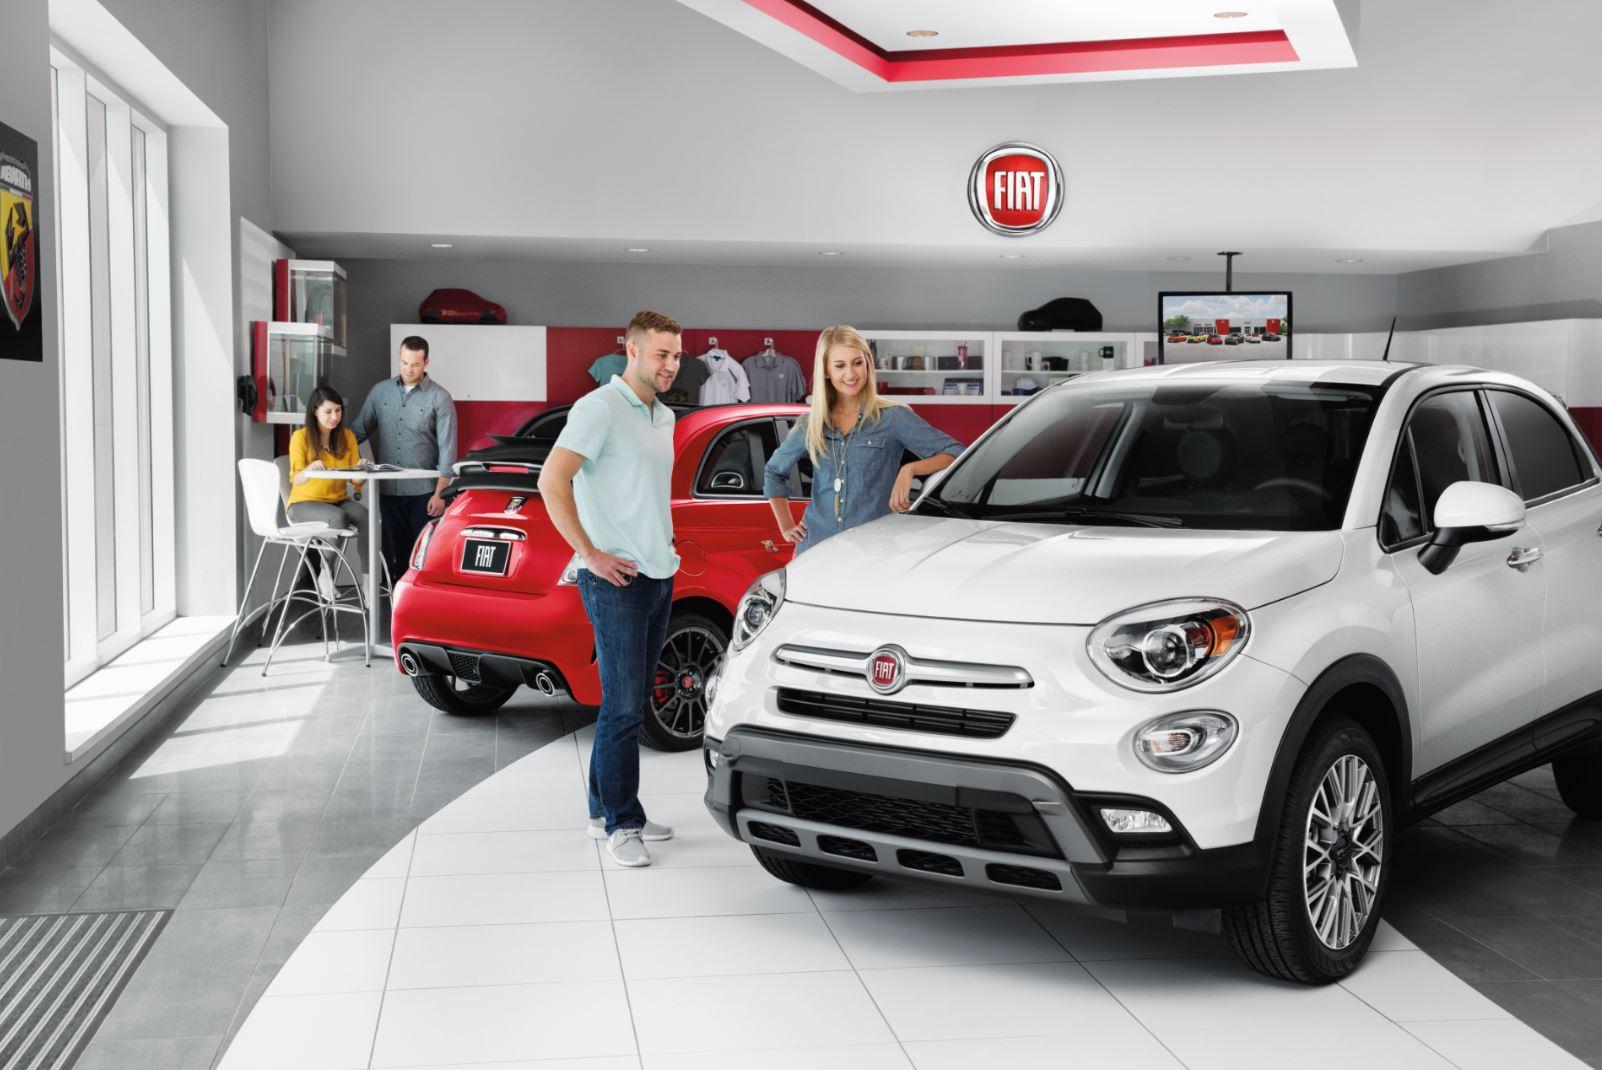 Used Car Dealership in Youngstown, OH | Bob & Chuck Eddy FIAT